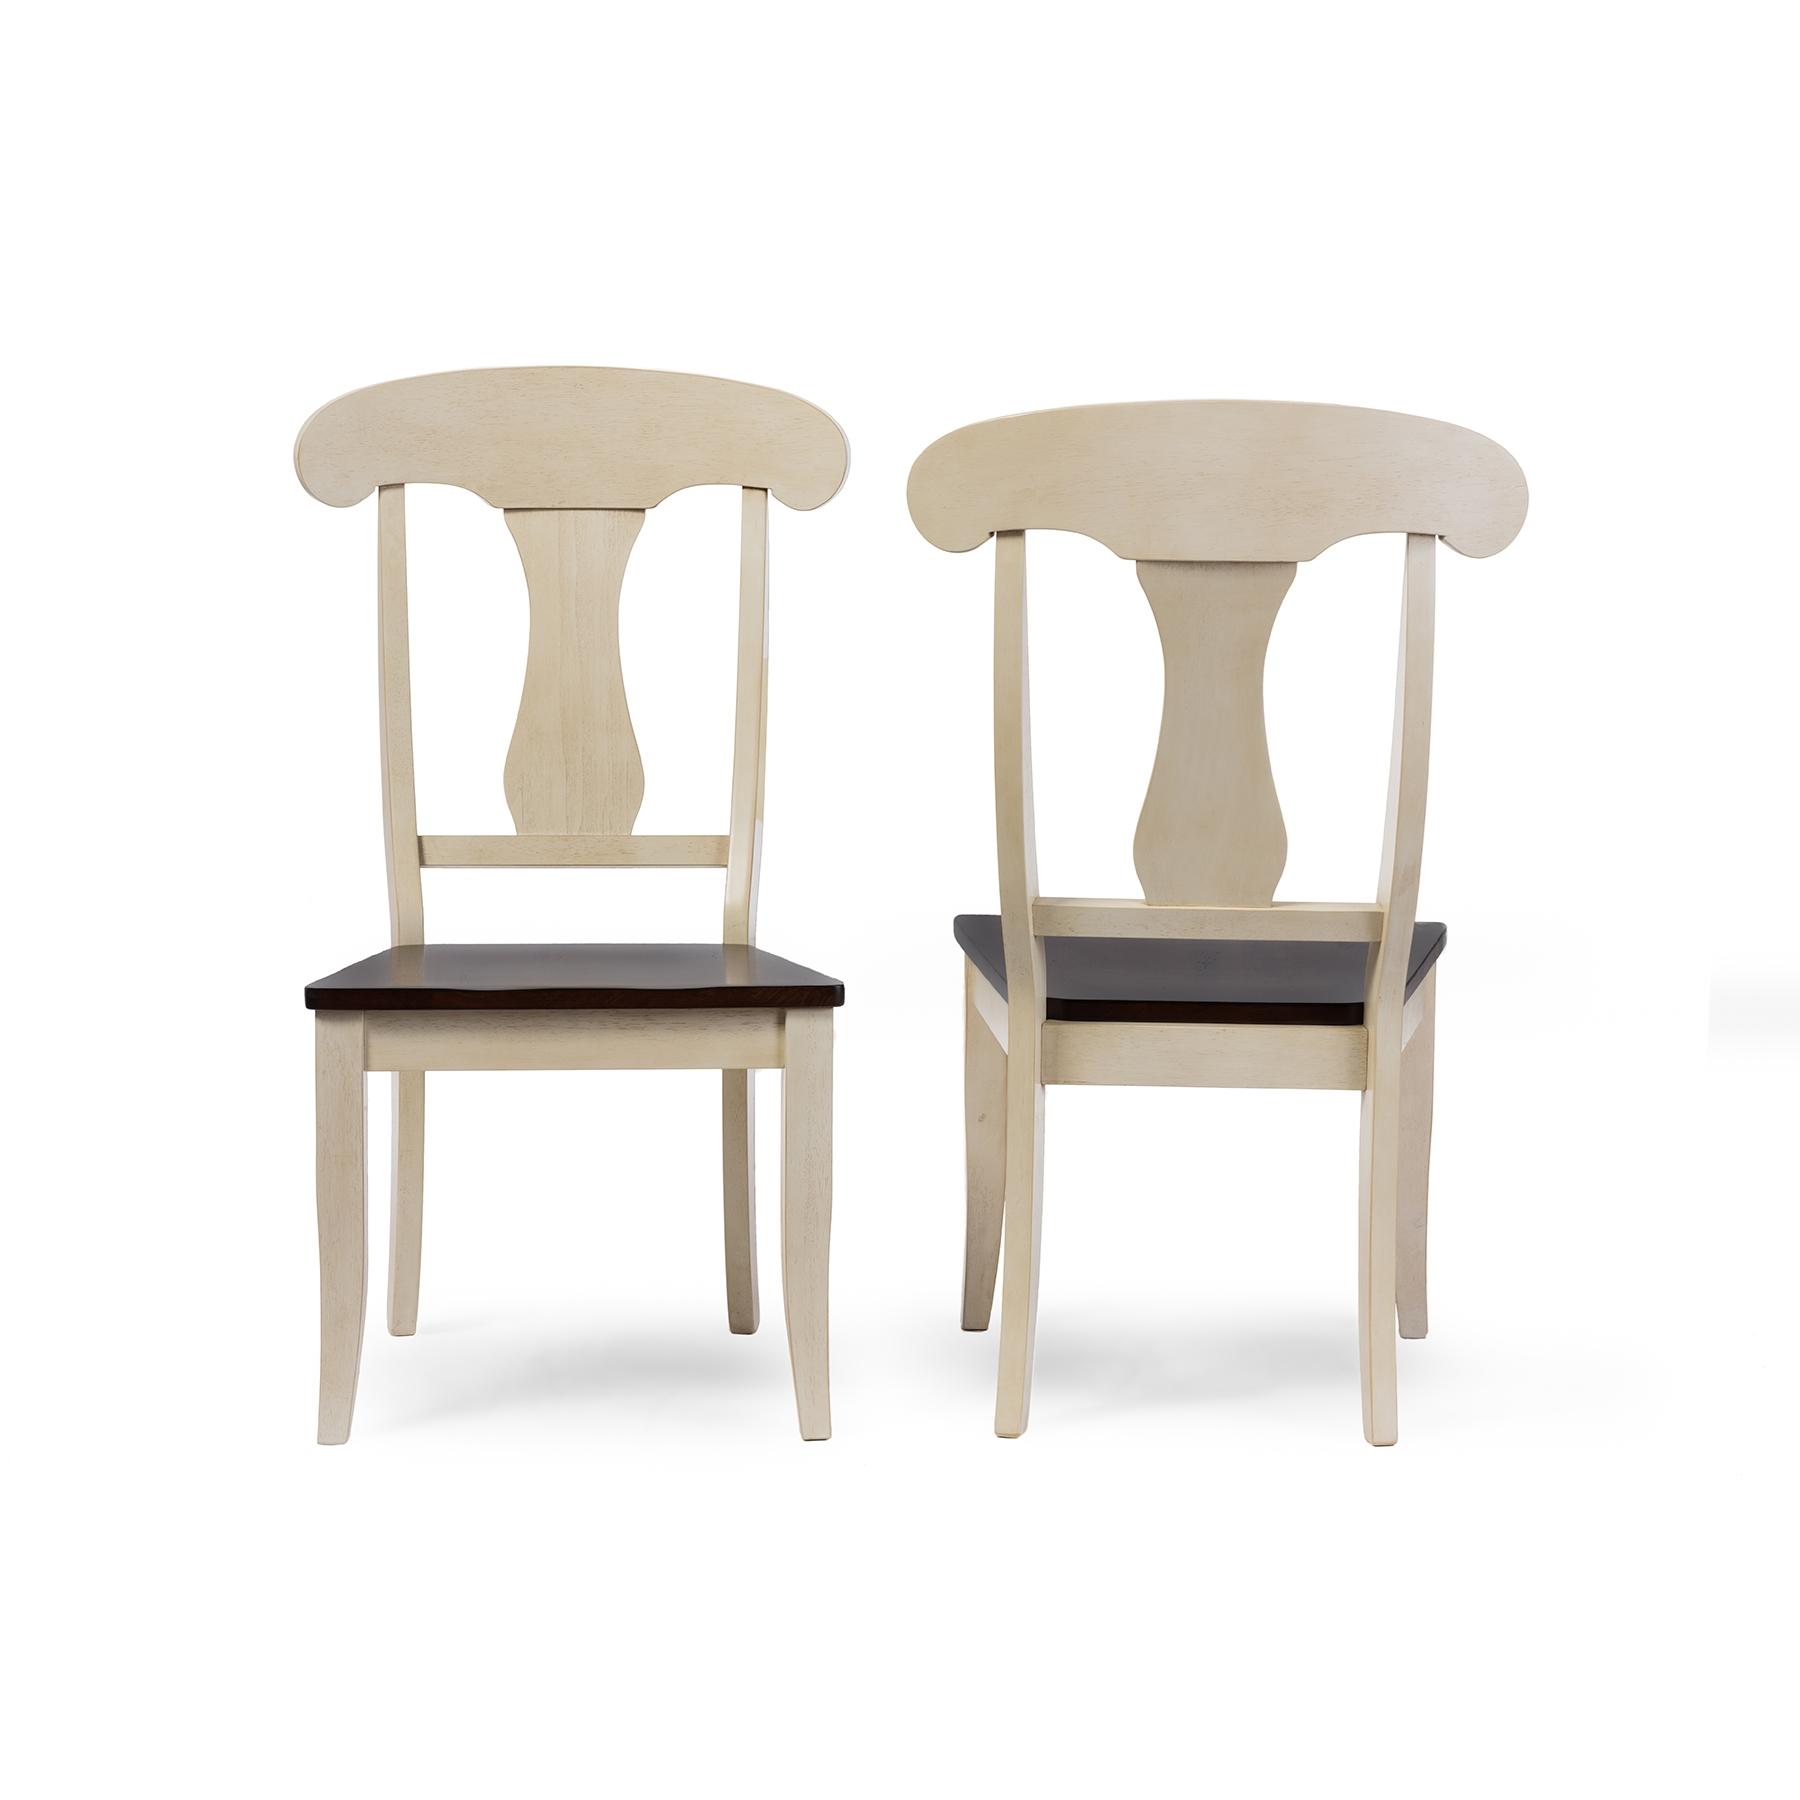 Antique White Dining Chair : Antique Furniture